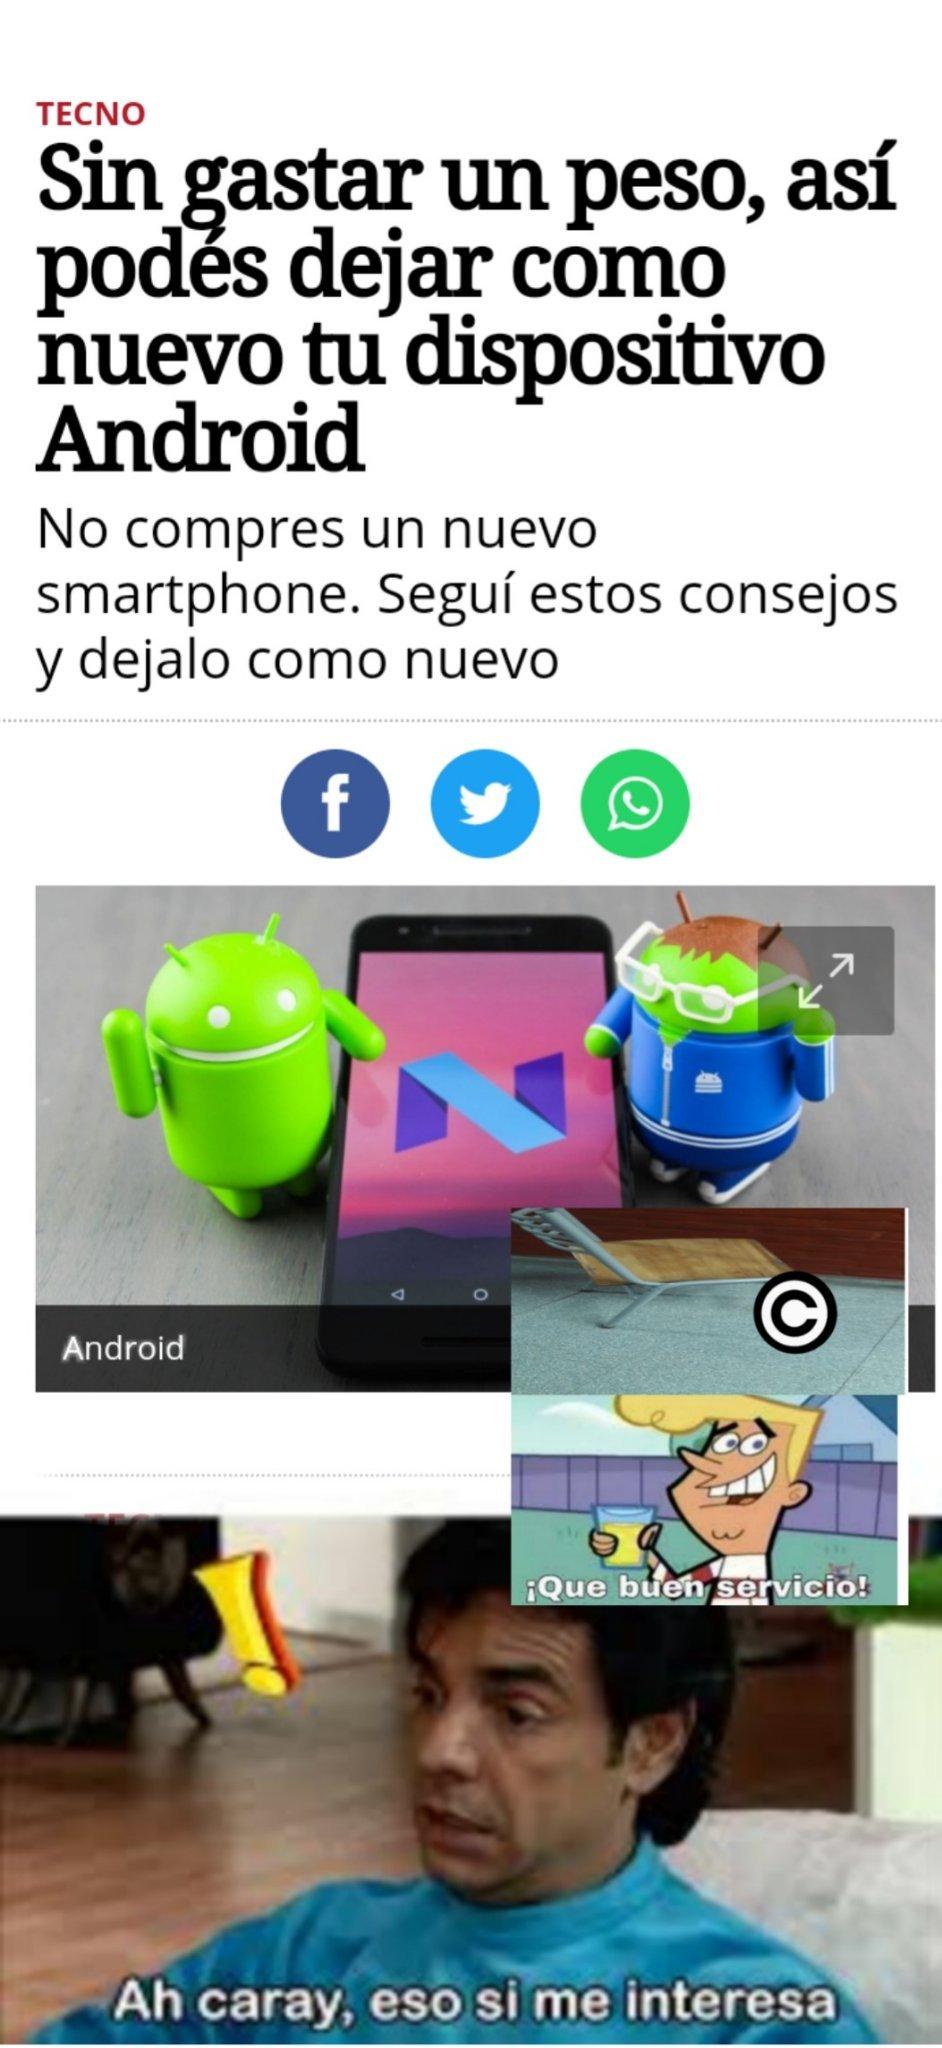 Para los que tengan android. Tengan un buen dia - meme